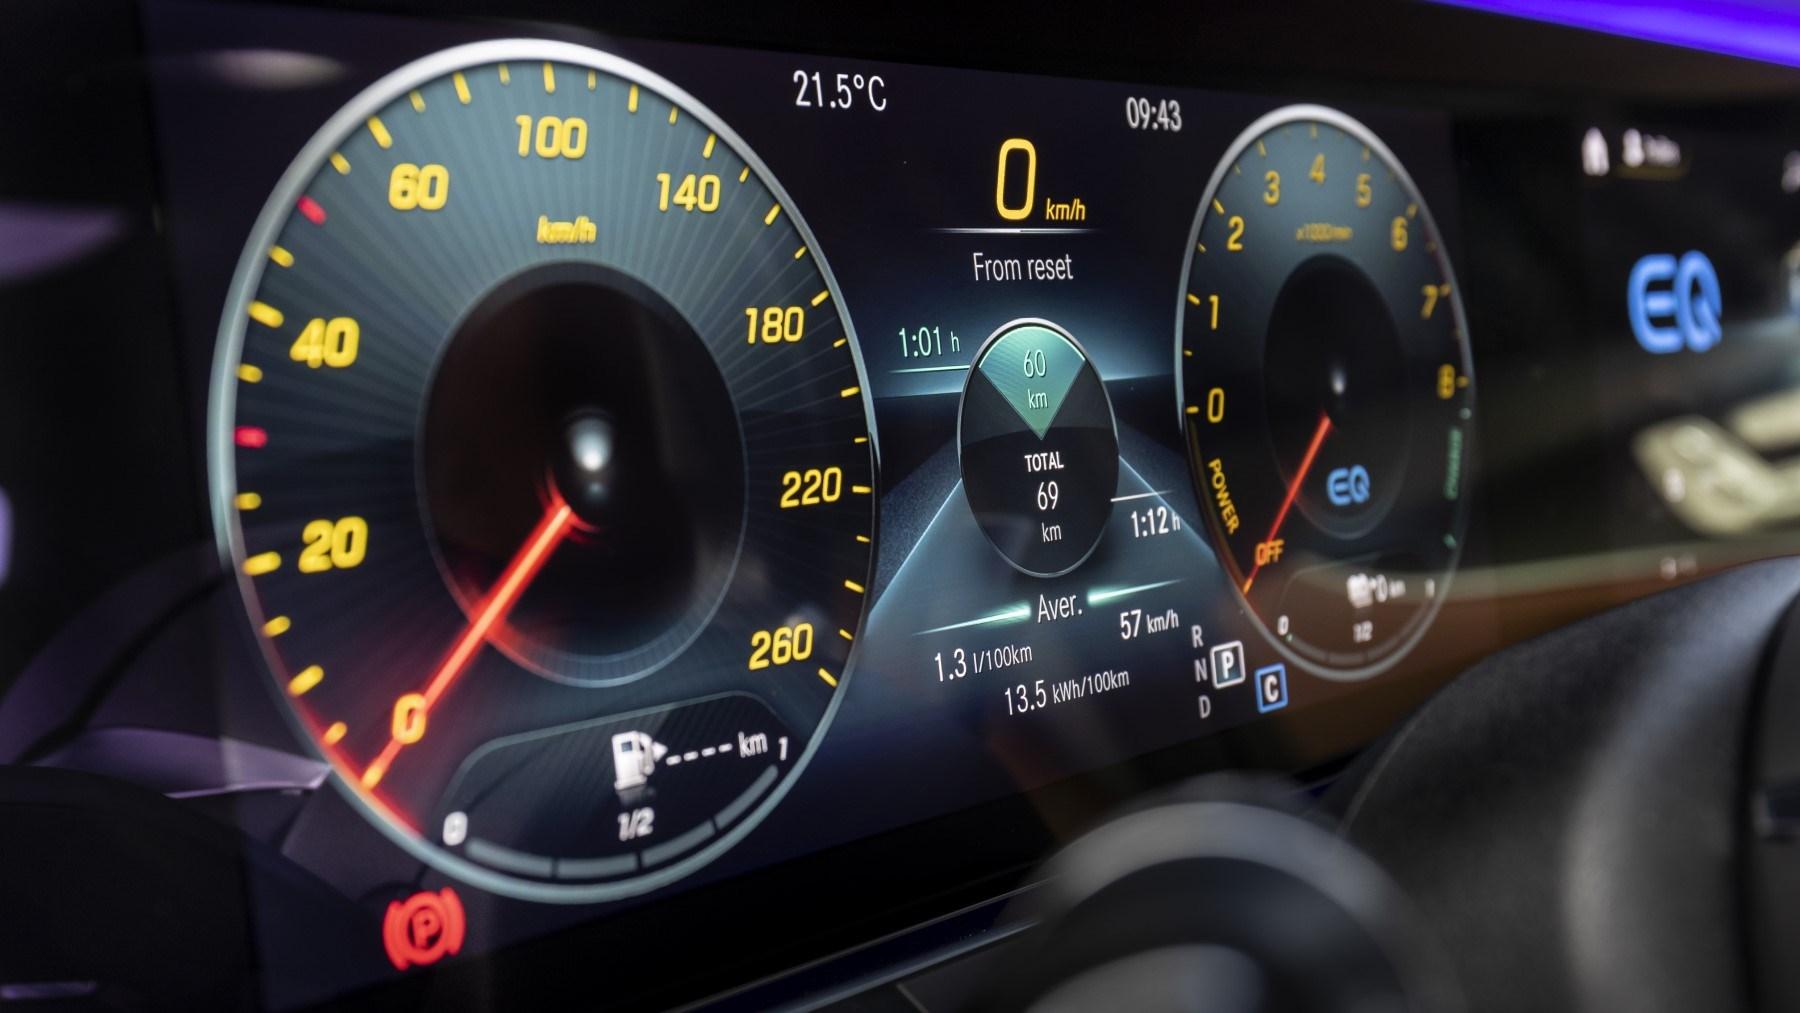 2020 Mercedes-Benz E-Class - dials